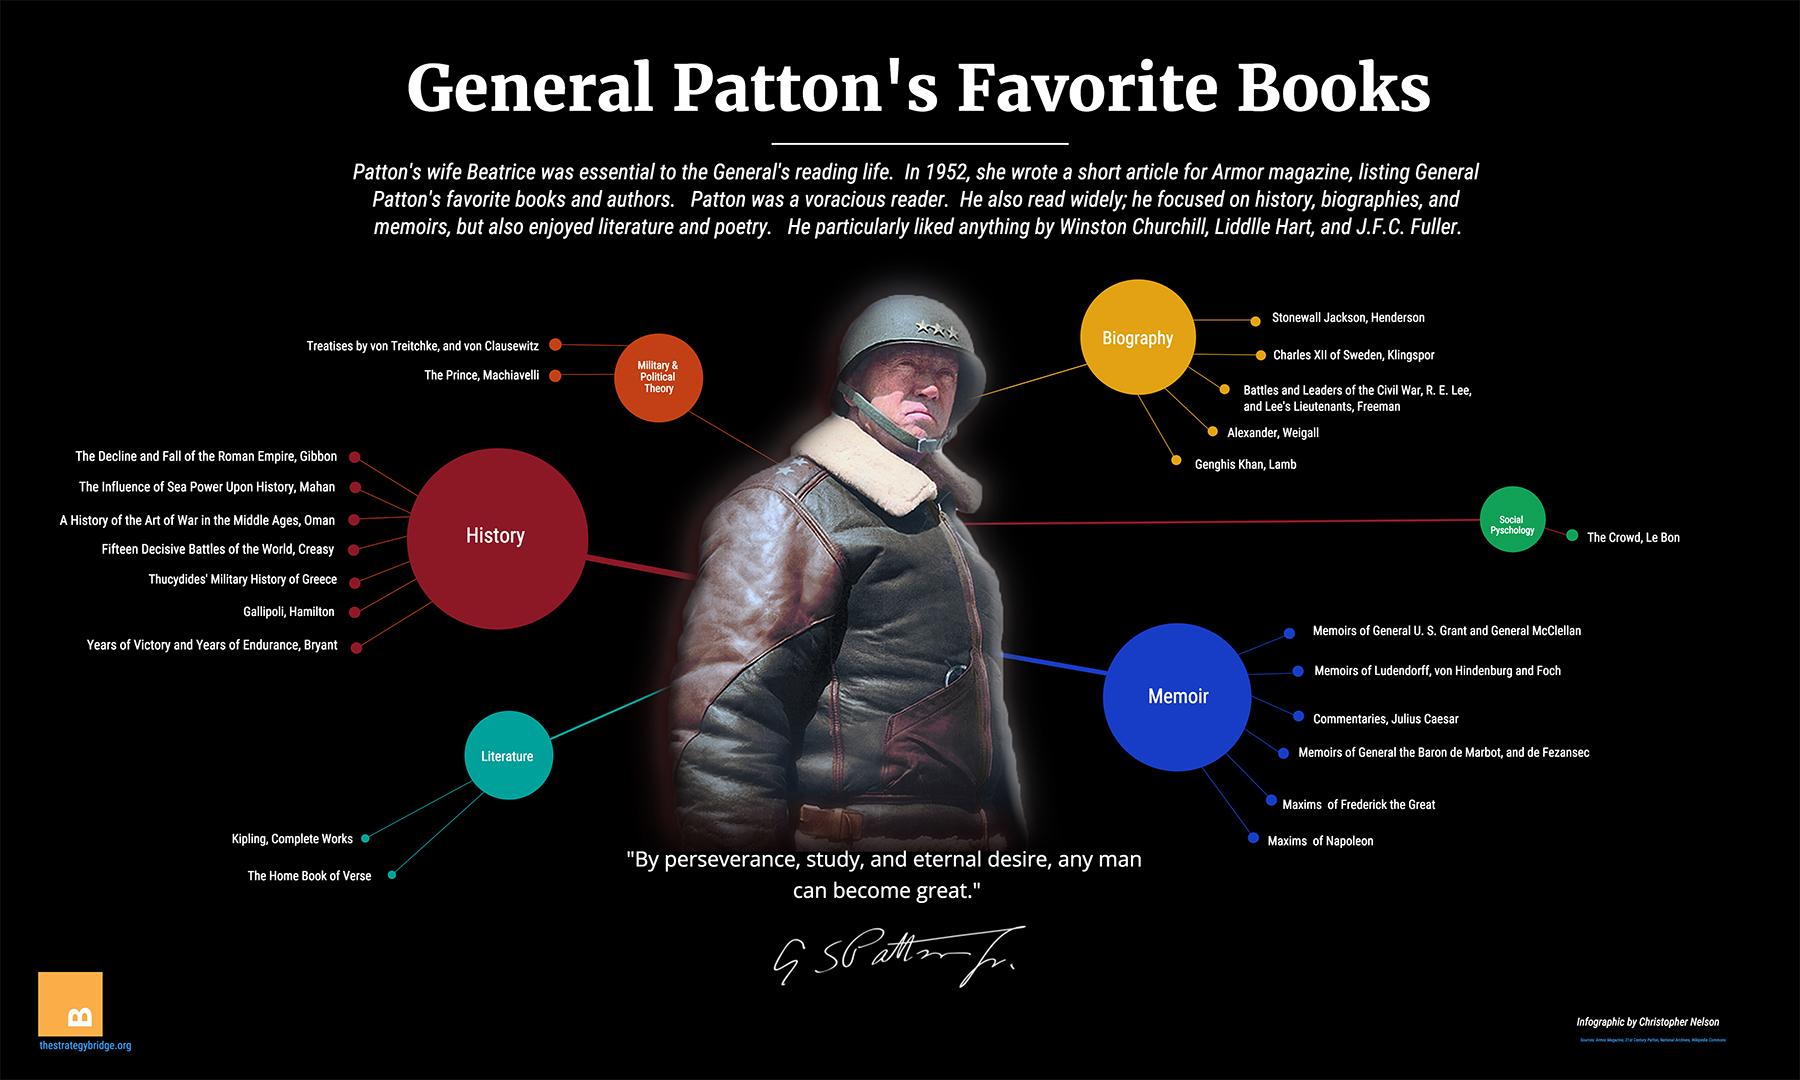 Patton's Reading List